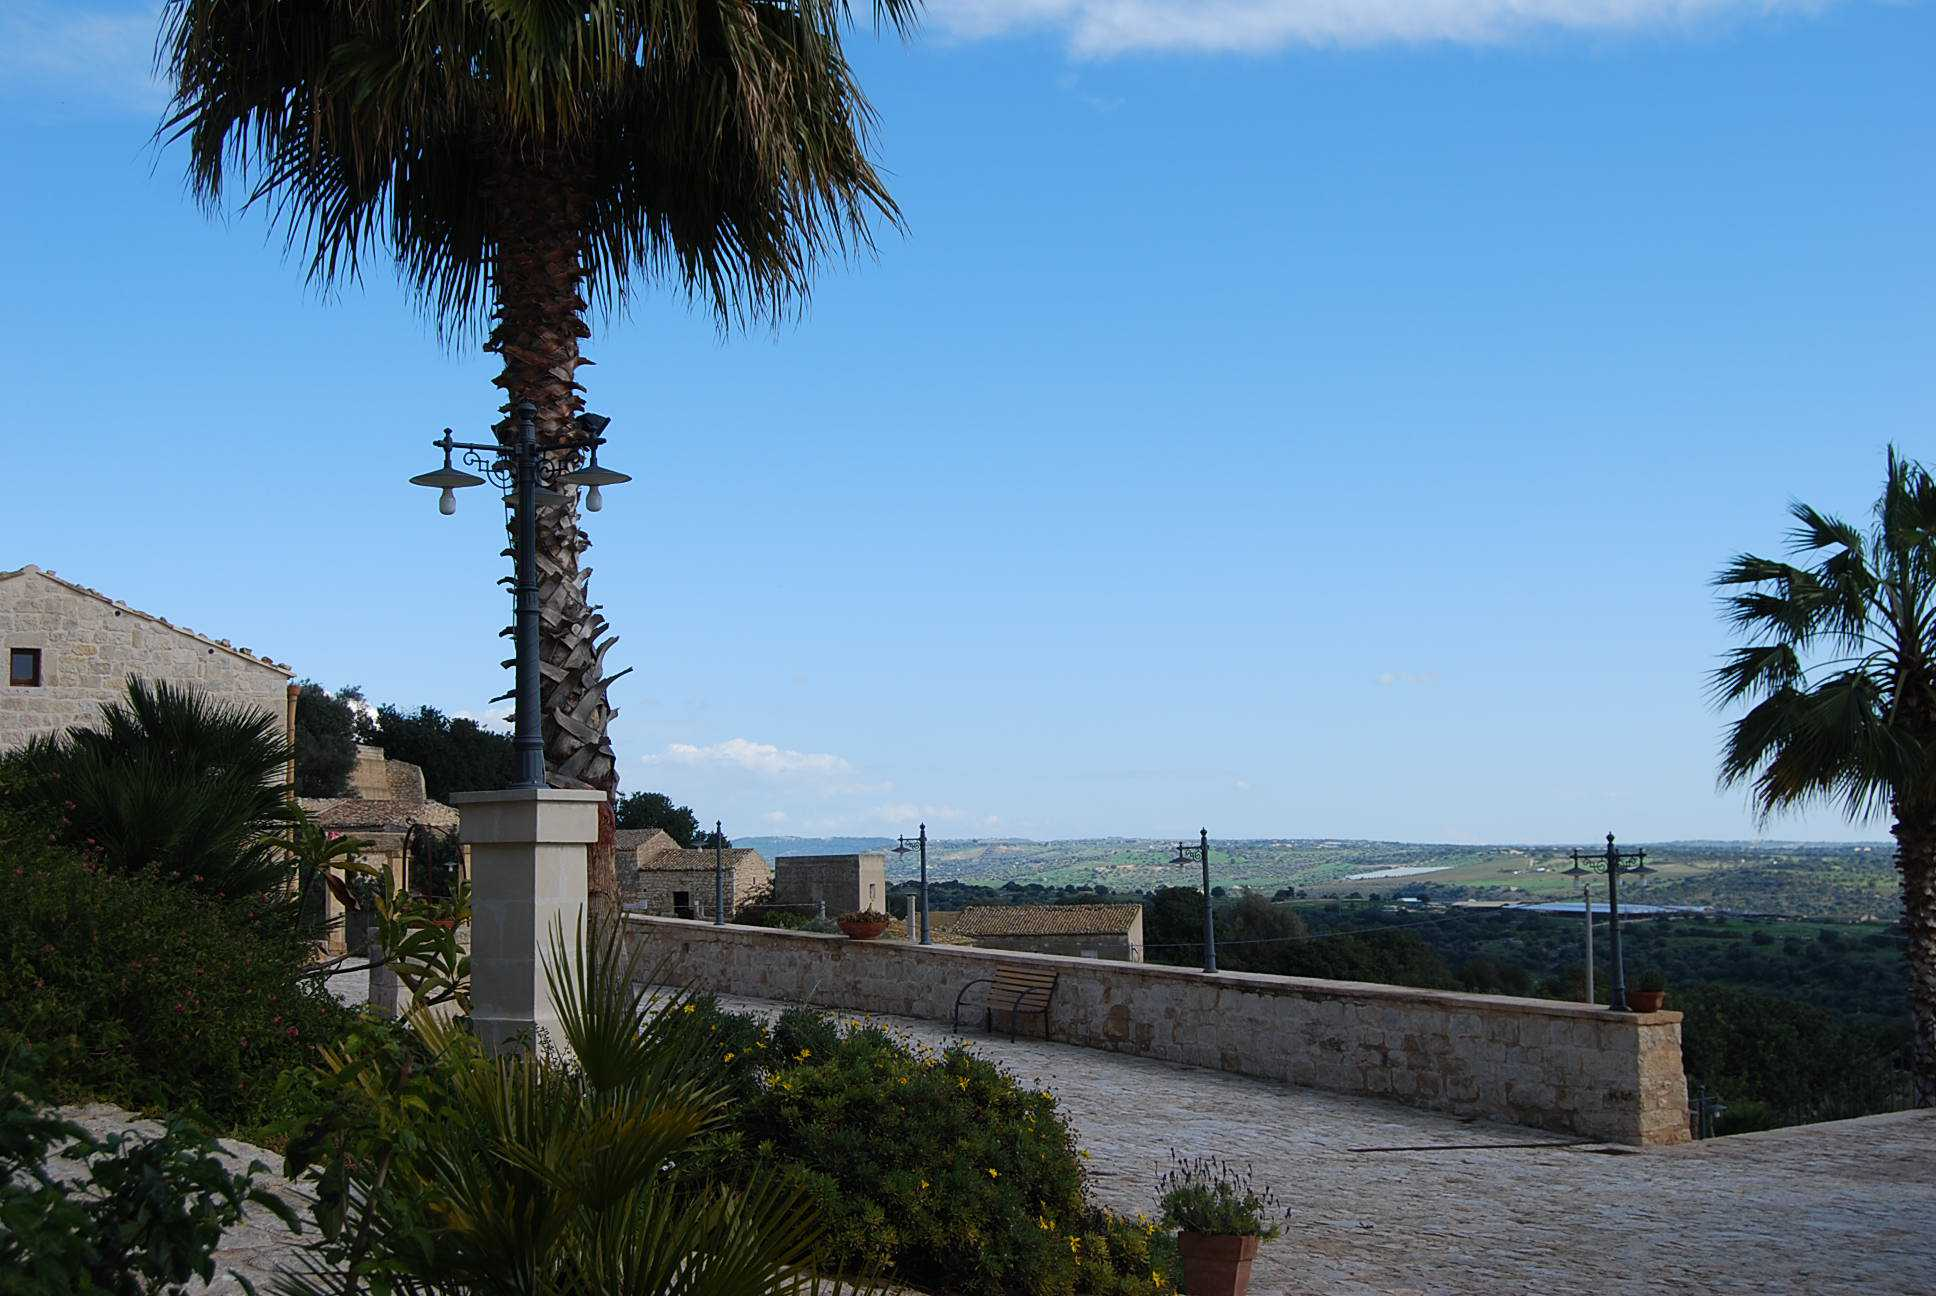 Silva Suri, Country Hotel, Ragusa, Marina di Ragusa, Sala Ricevimenti. Hotel